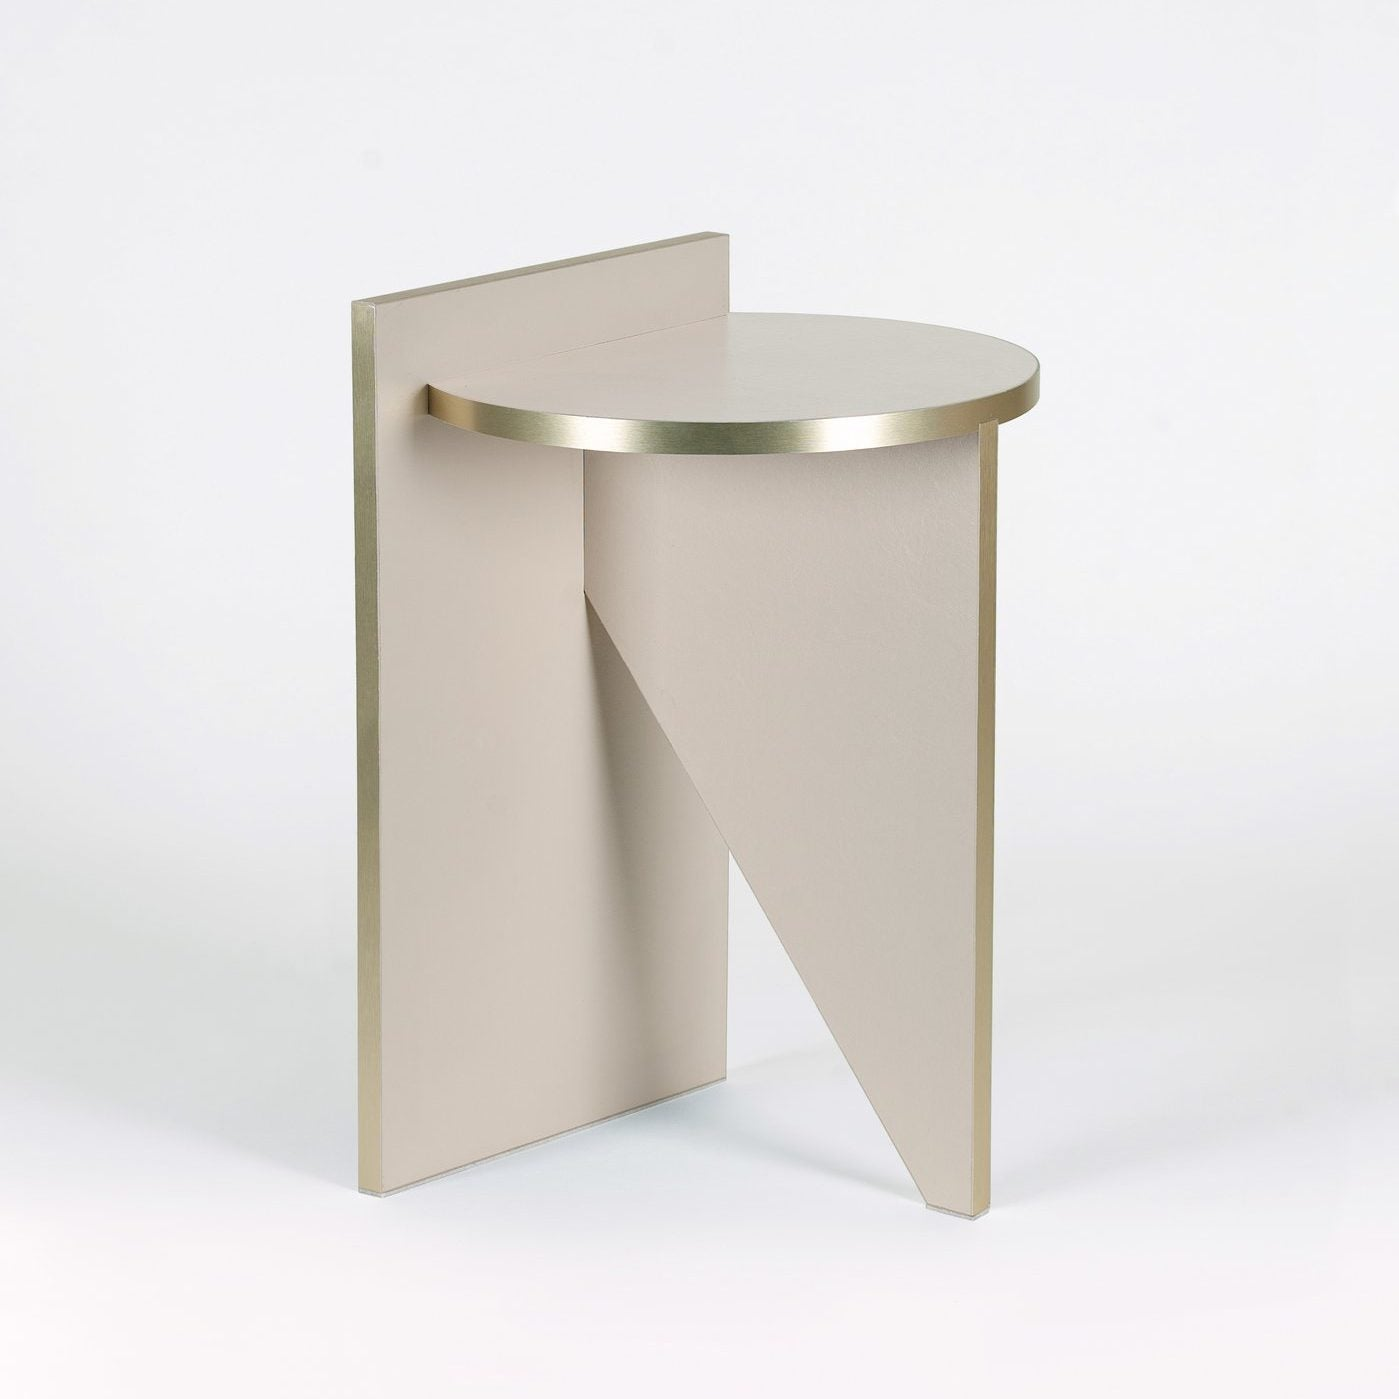 Caspian_Small_2_Contrast_Table_1800x1800